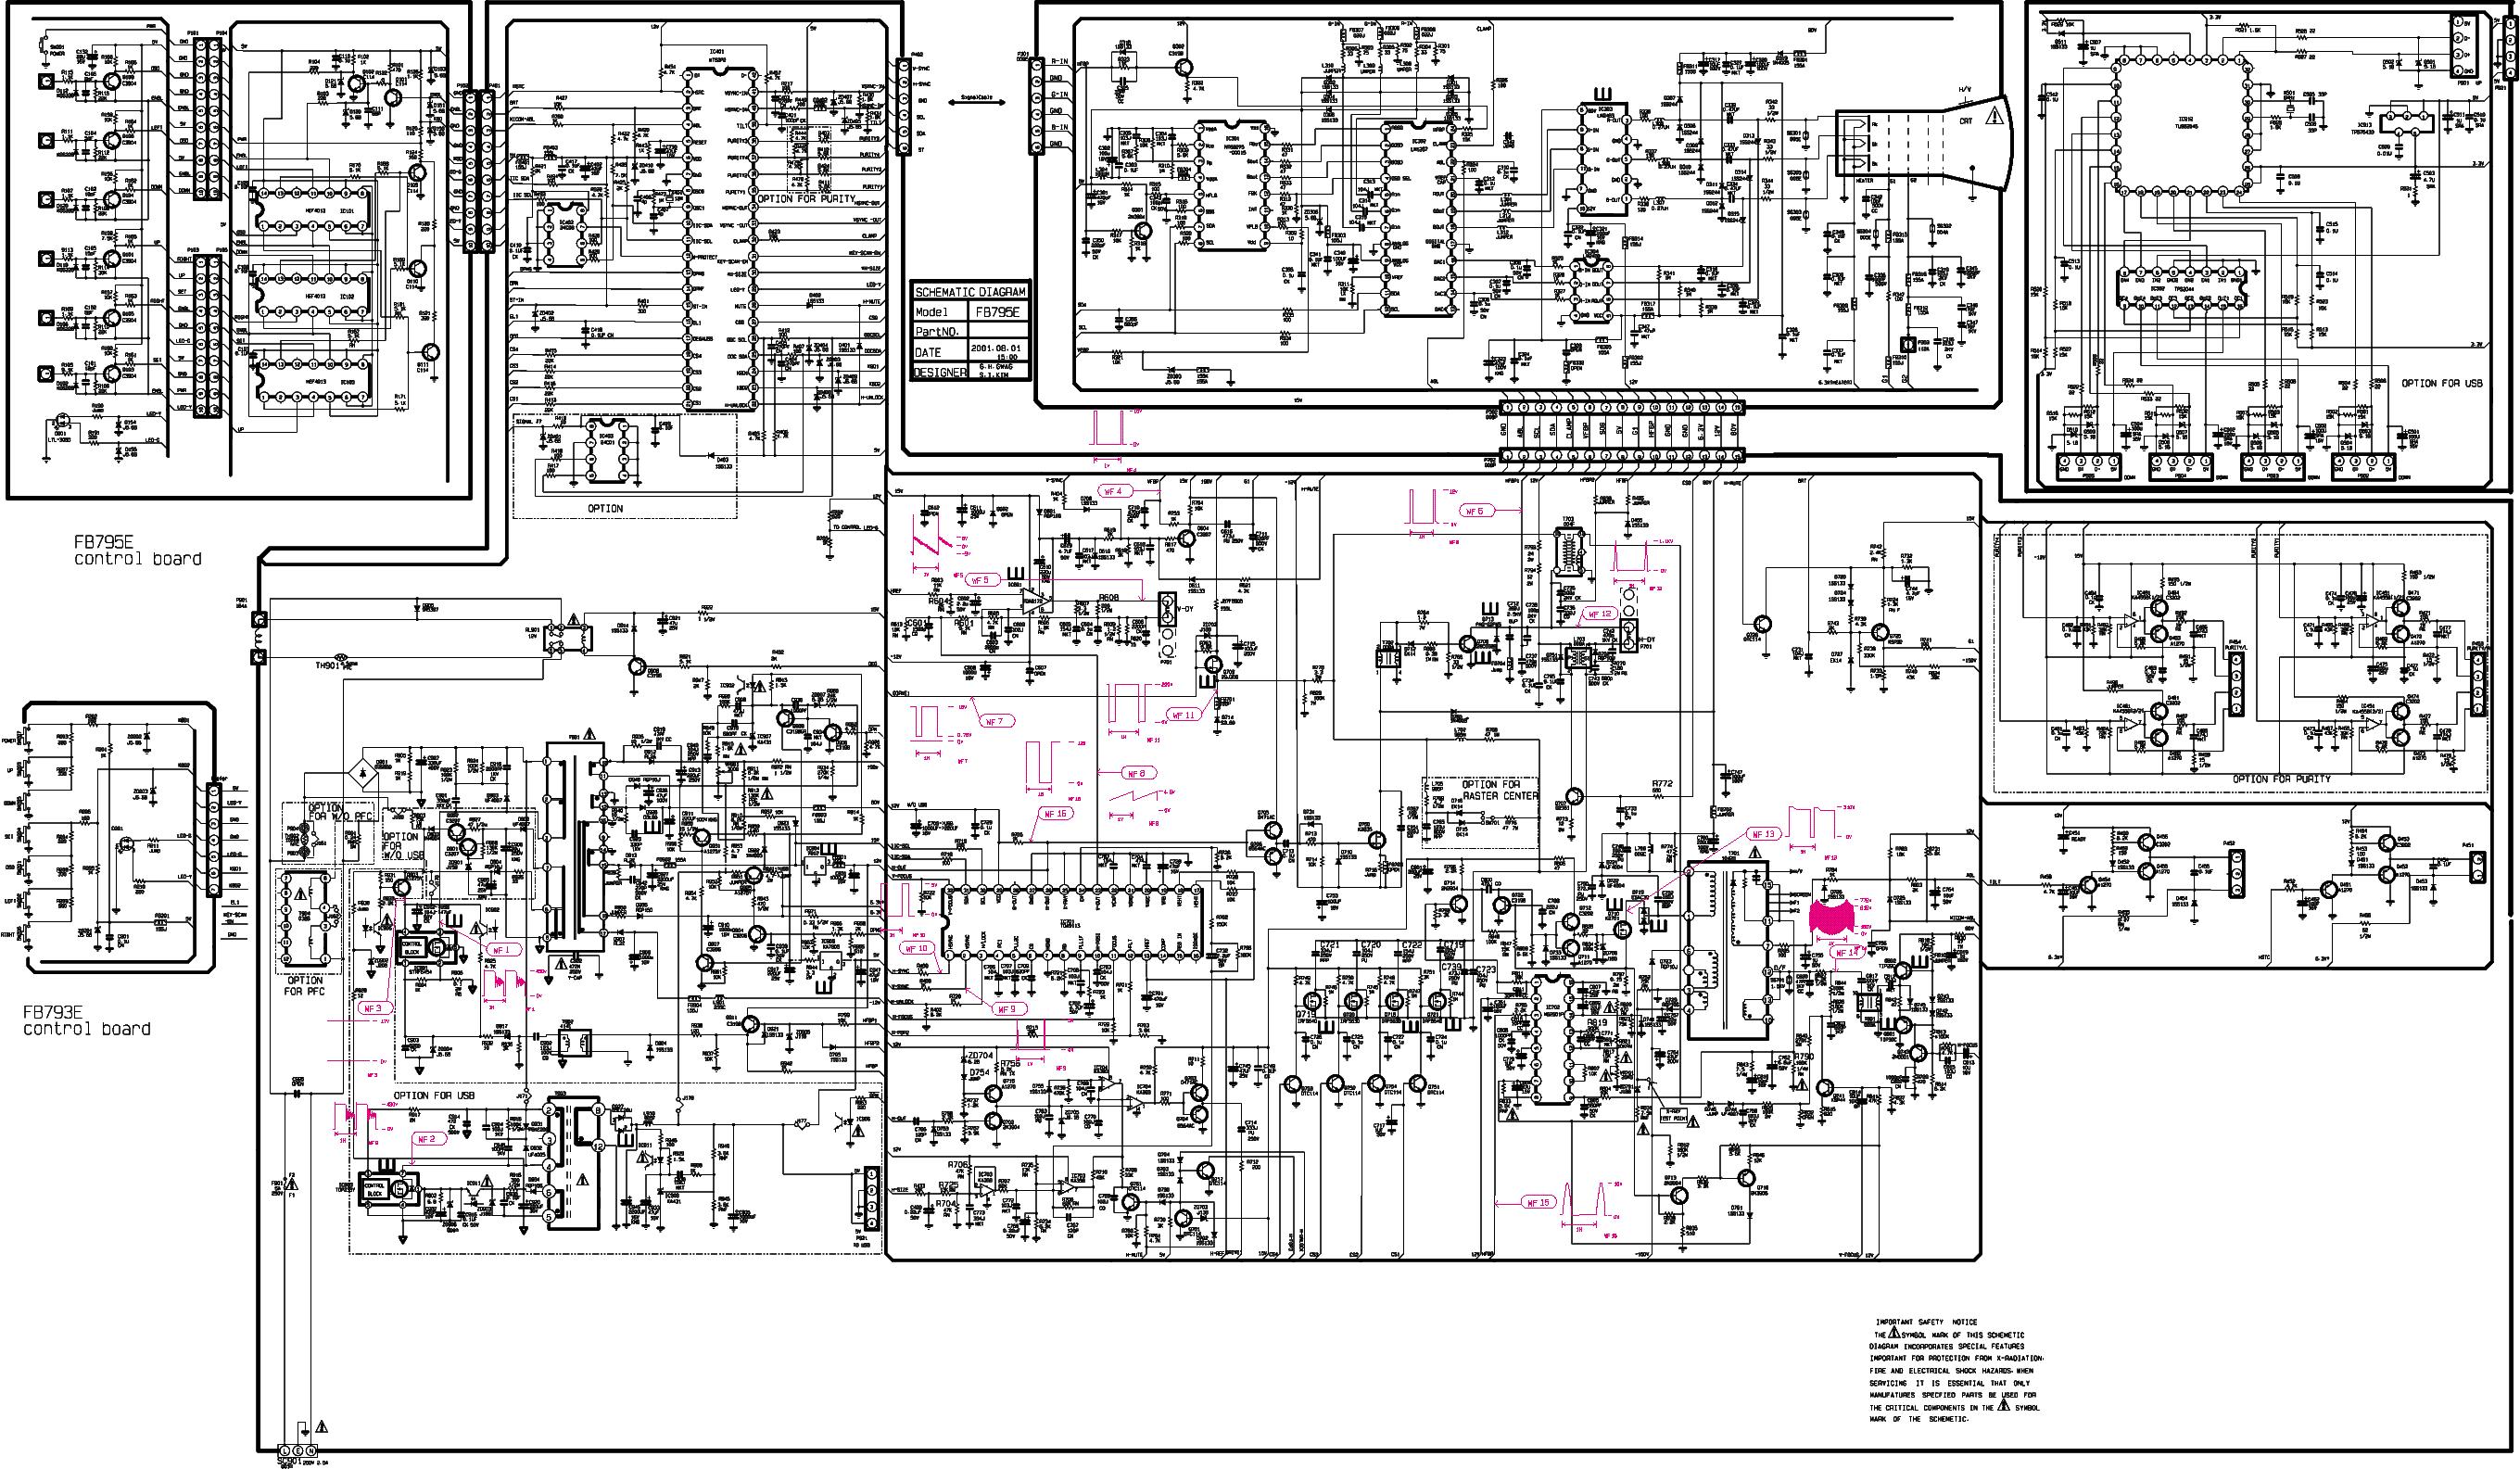 Lg 21fa26 Mc 019d Str W Tda Sch Service Manual